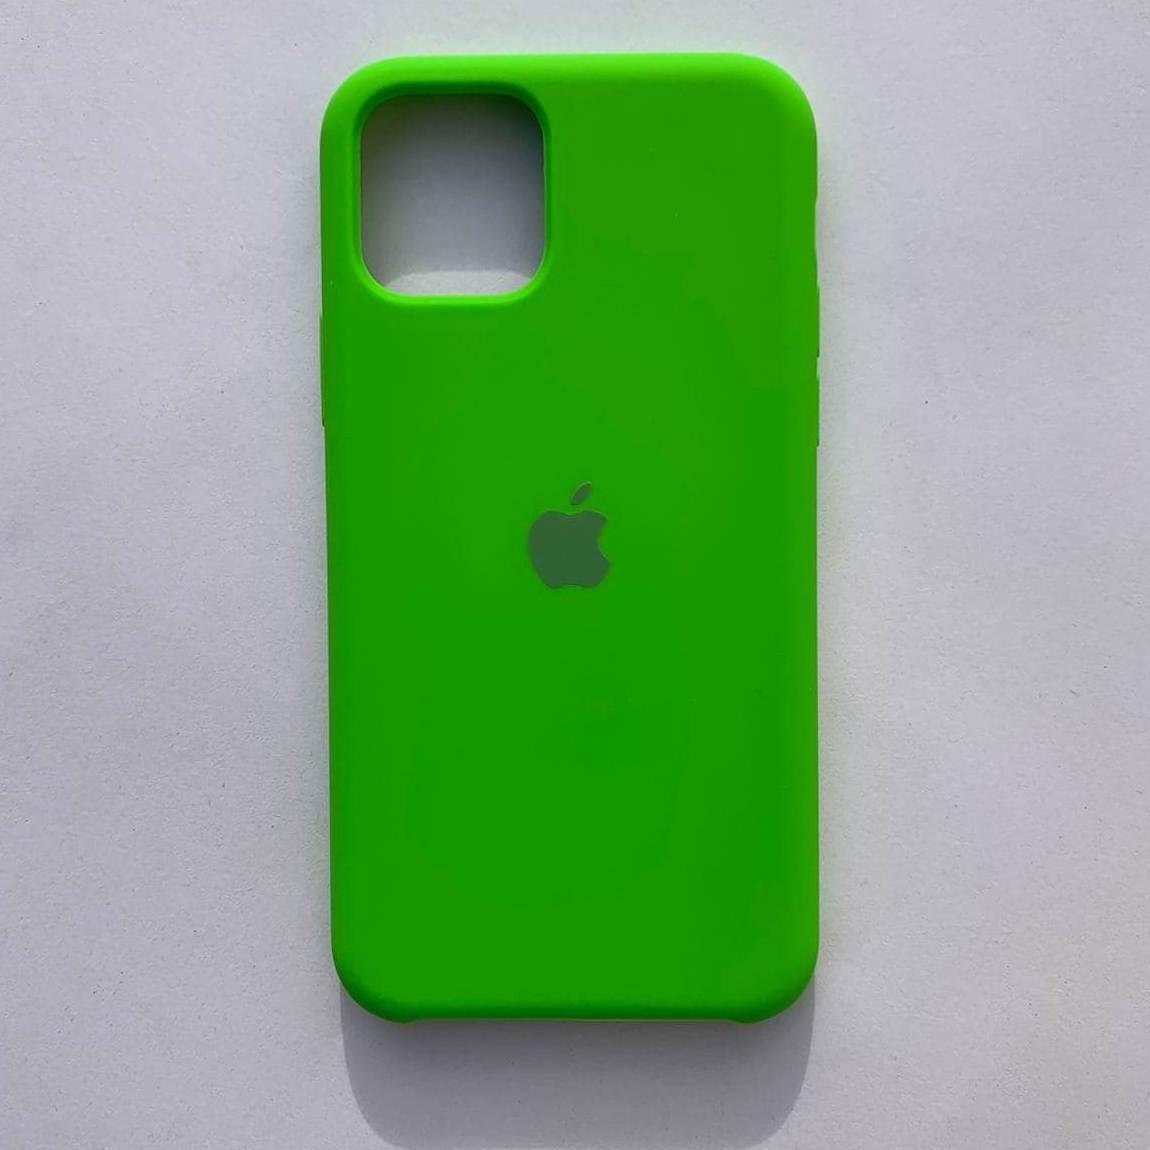 Чехол-накладка Silicone Case для Apple iPhone 11 Pro Max Dark Green